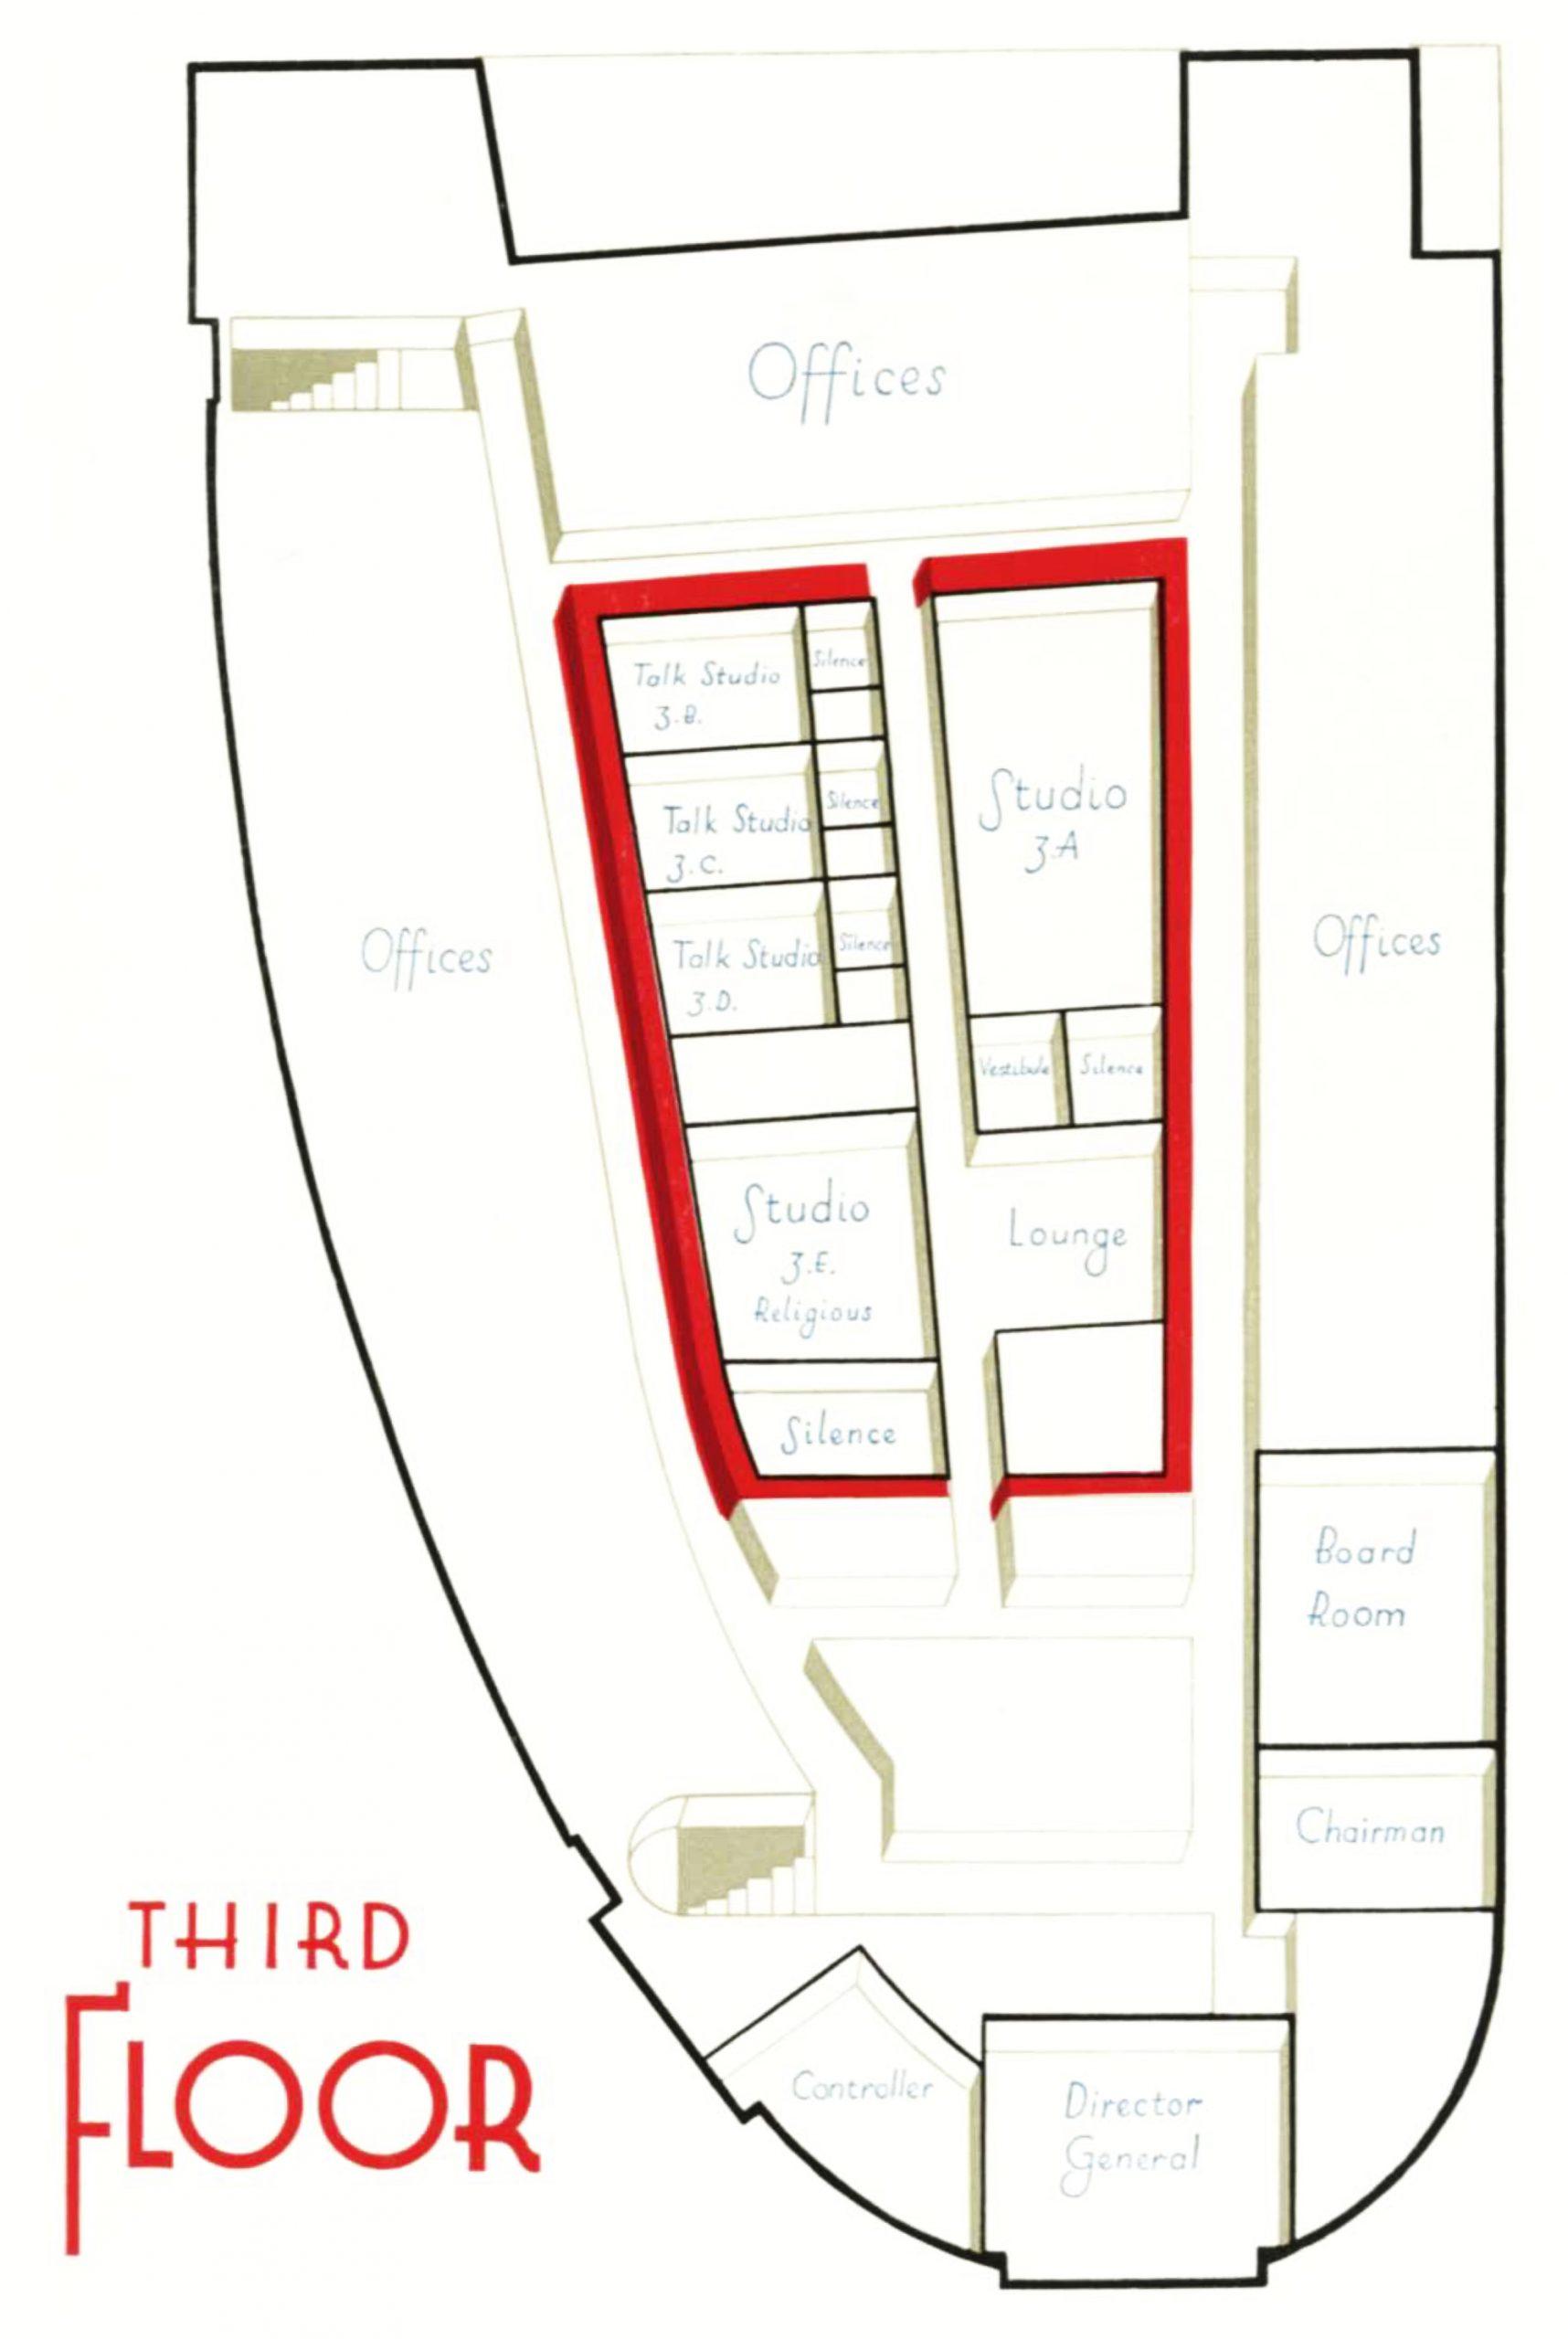 Diagram of the third floor